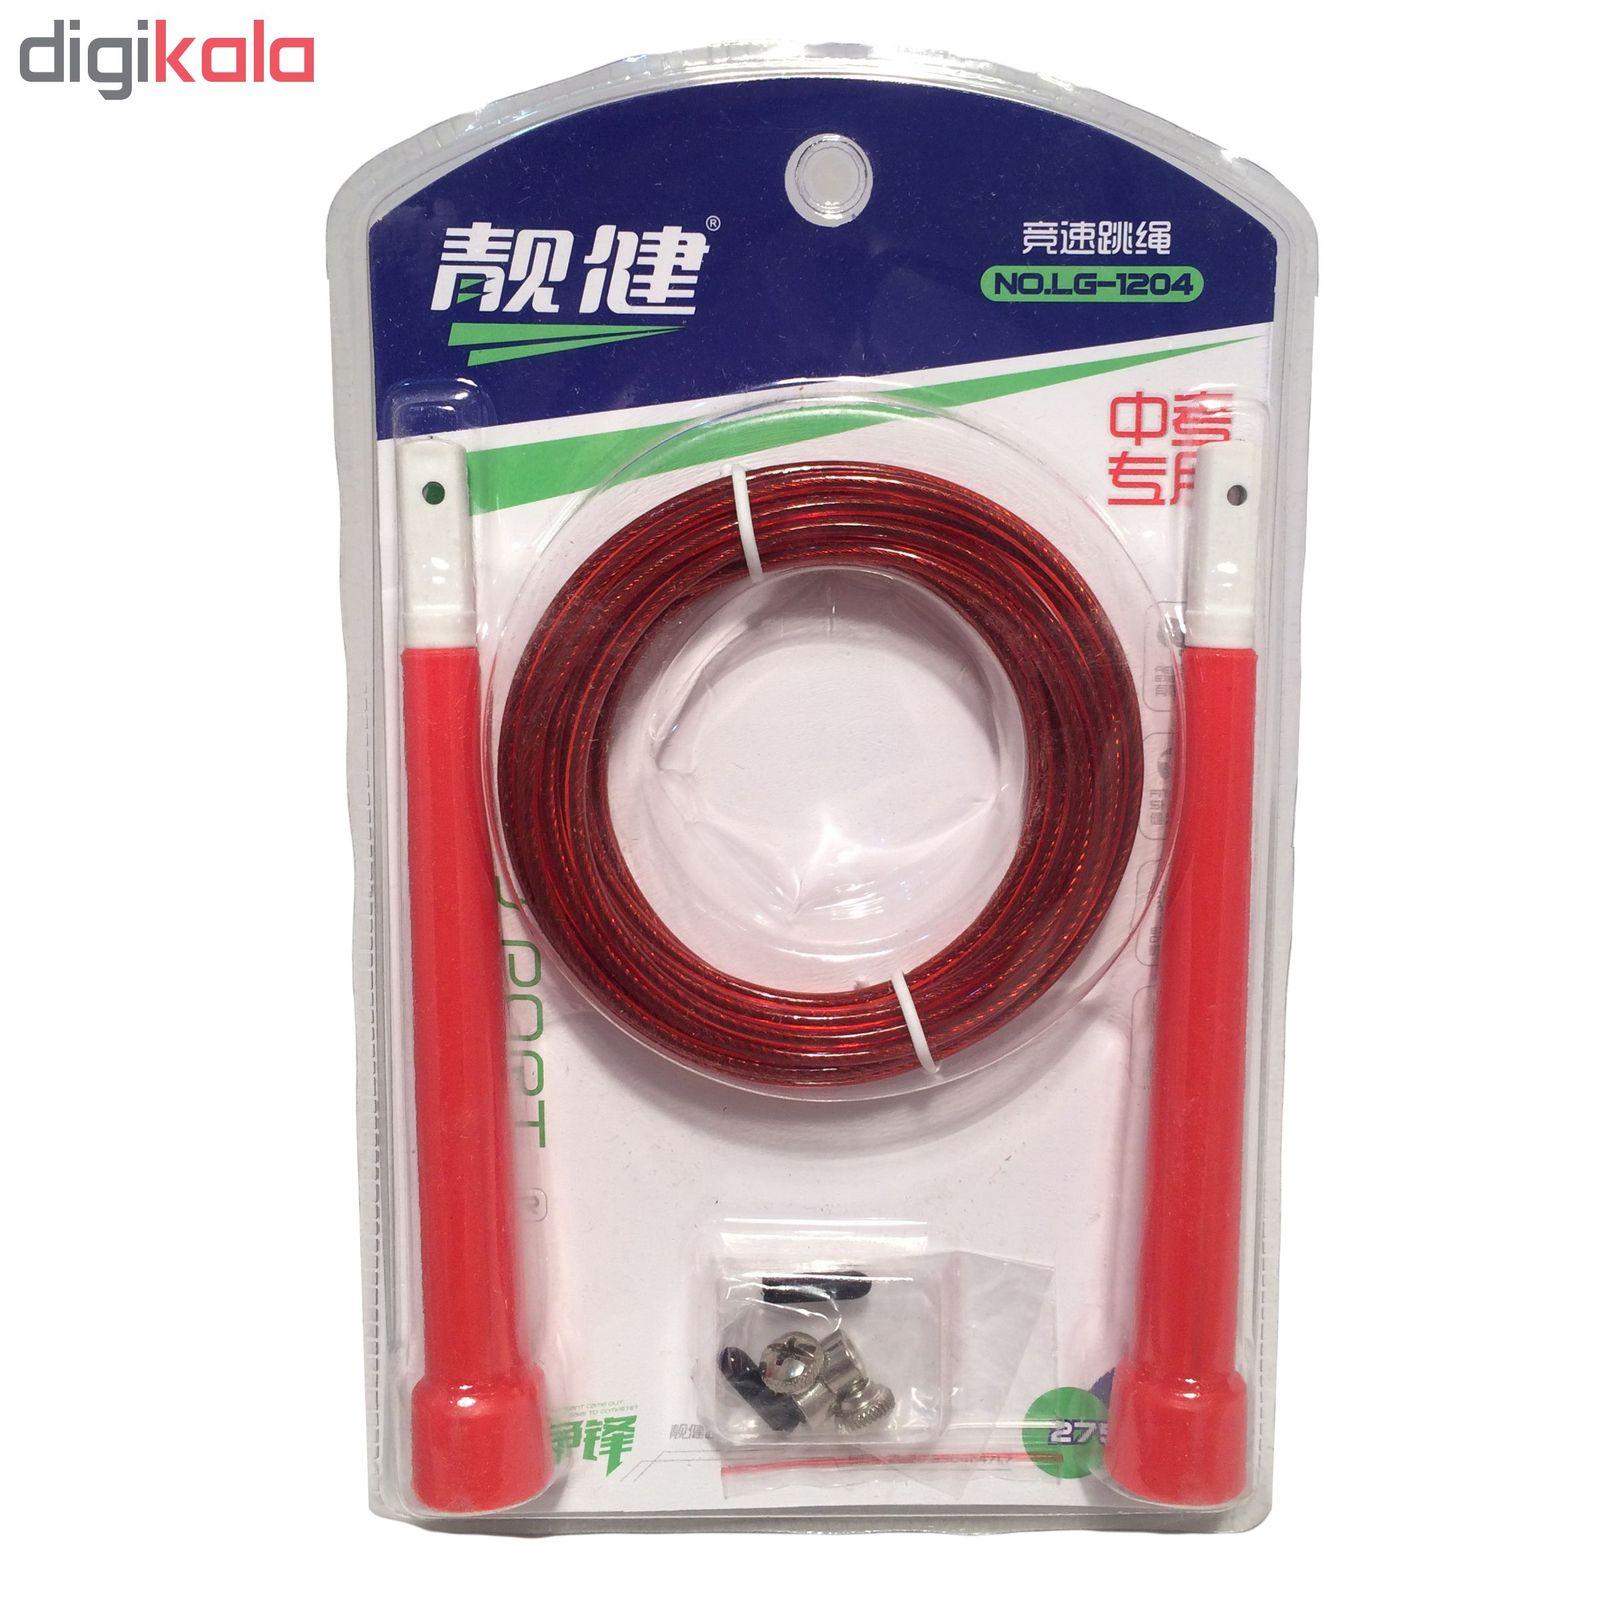 طناب ورزشی کد 1204 main 1 1